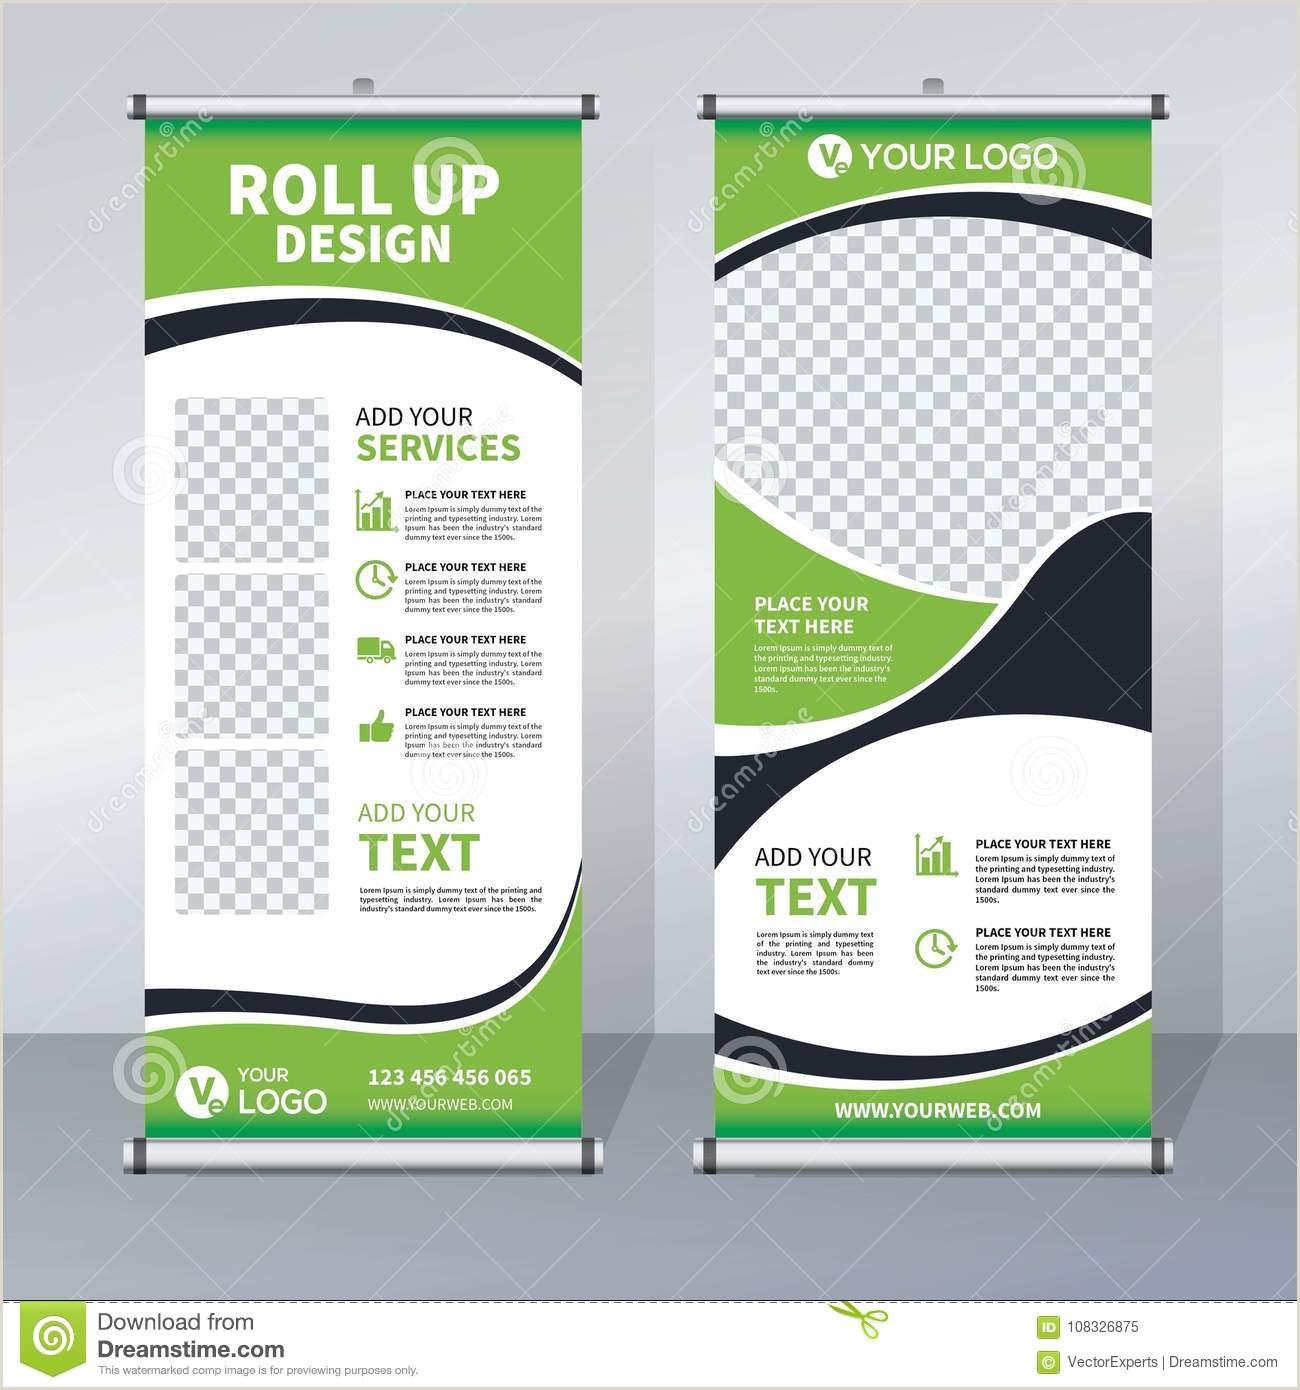 Retractable Banner Signs Retractable Banner Stock Illustrations – 701 Retractable